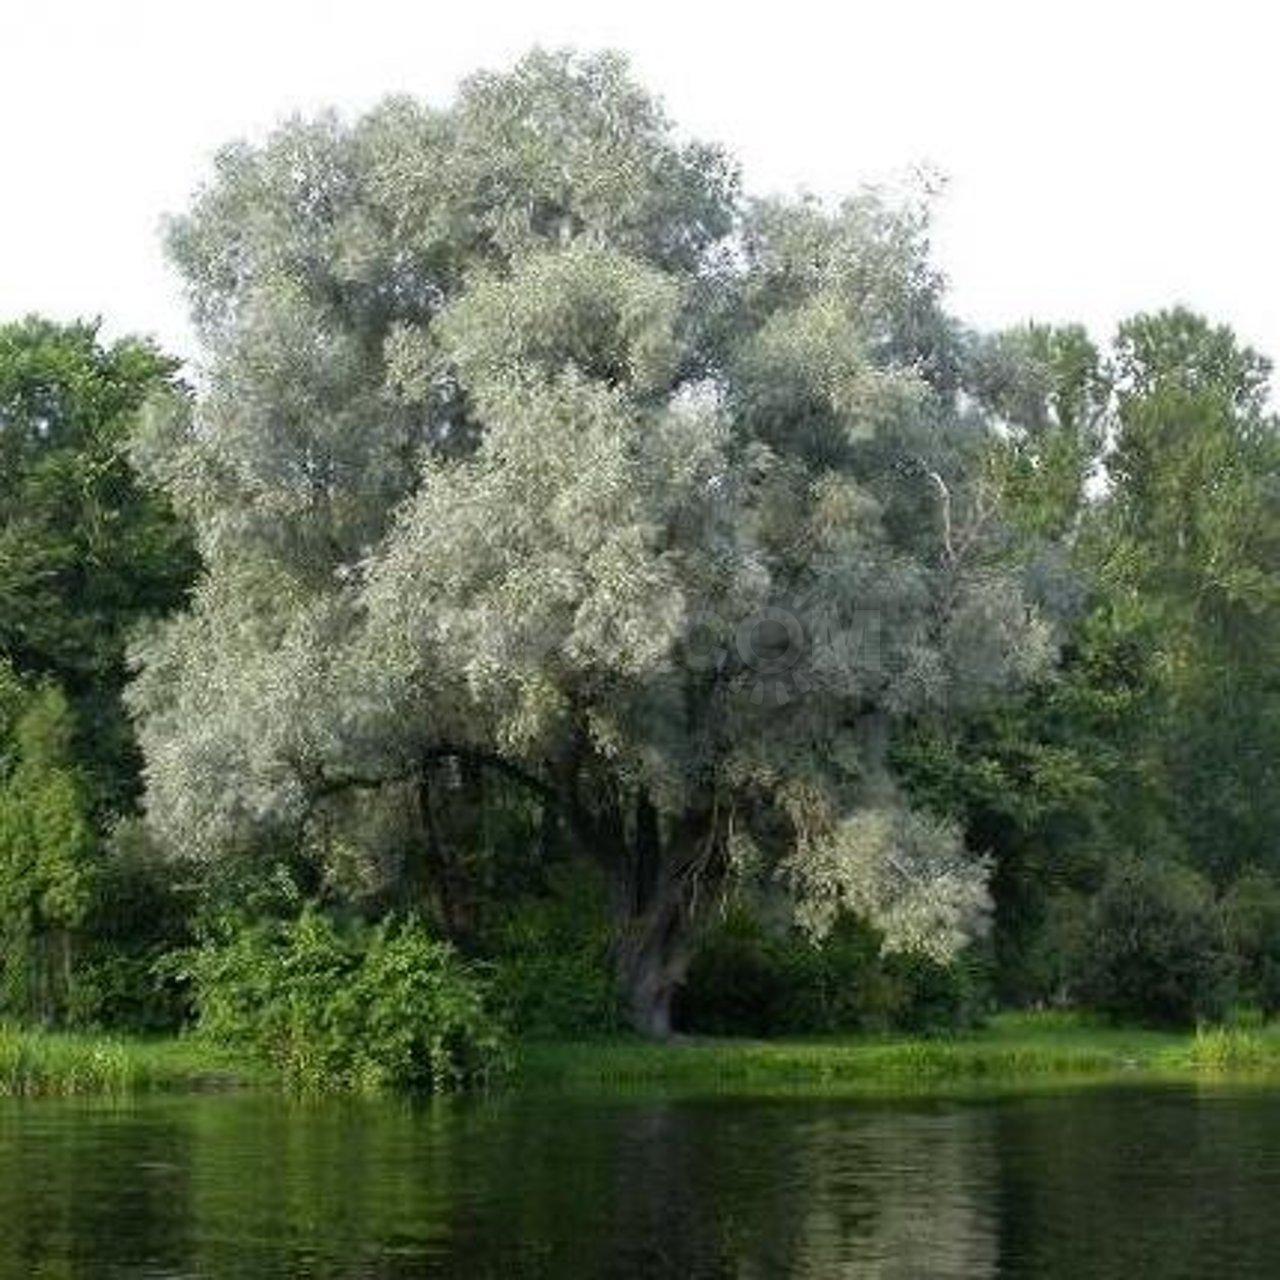 Salix alba var. argentea